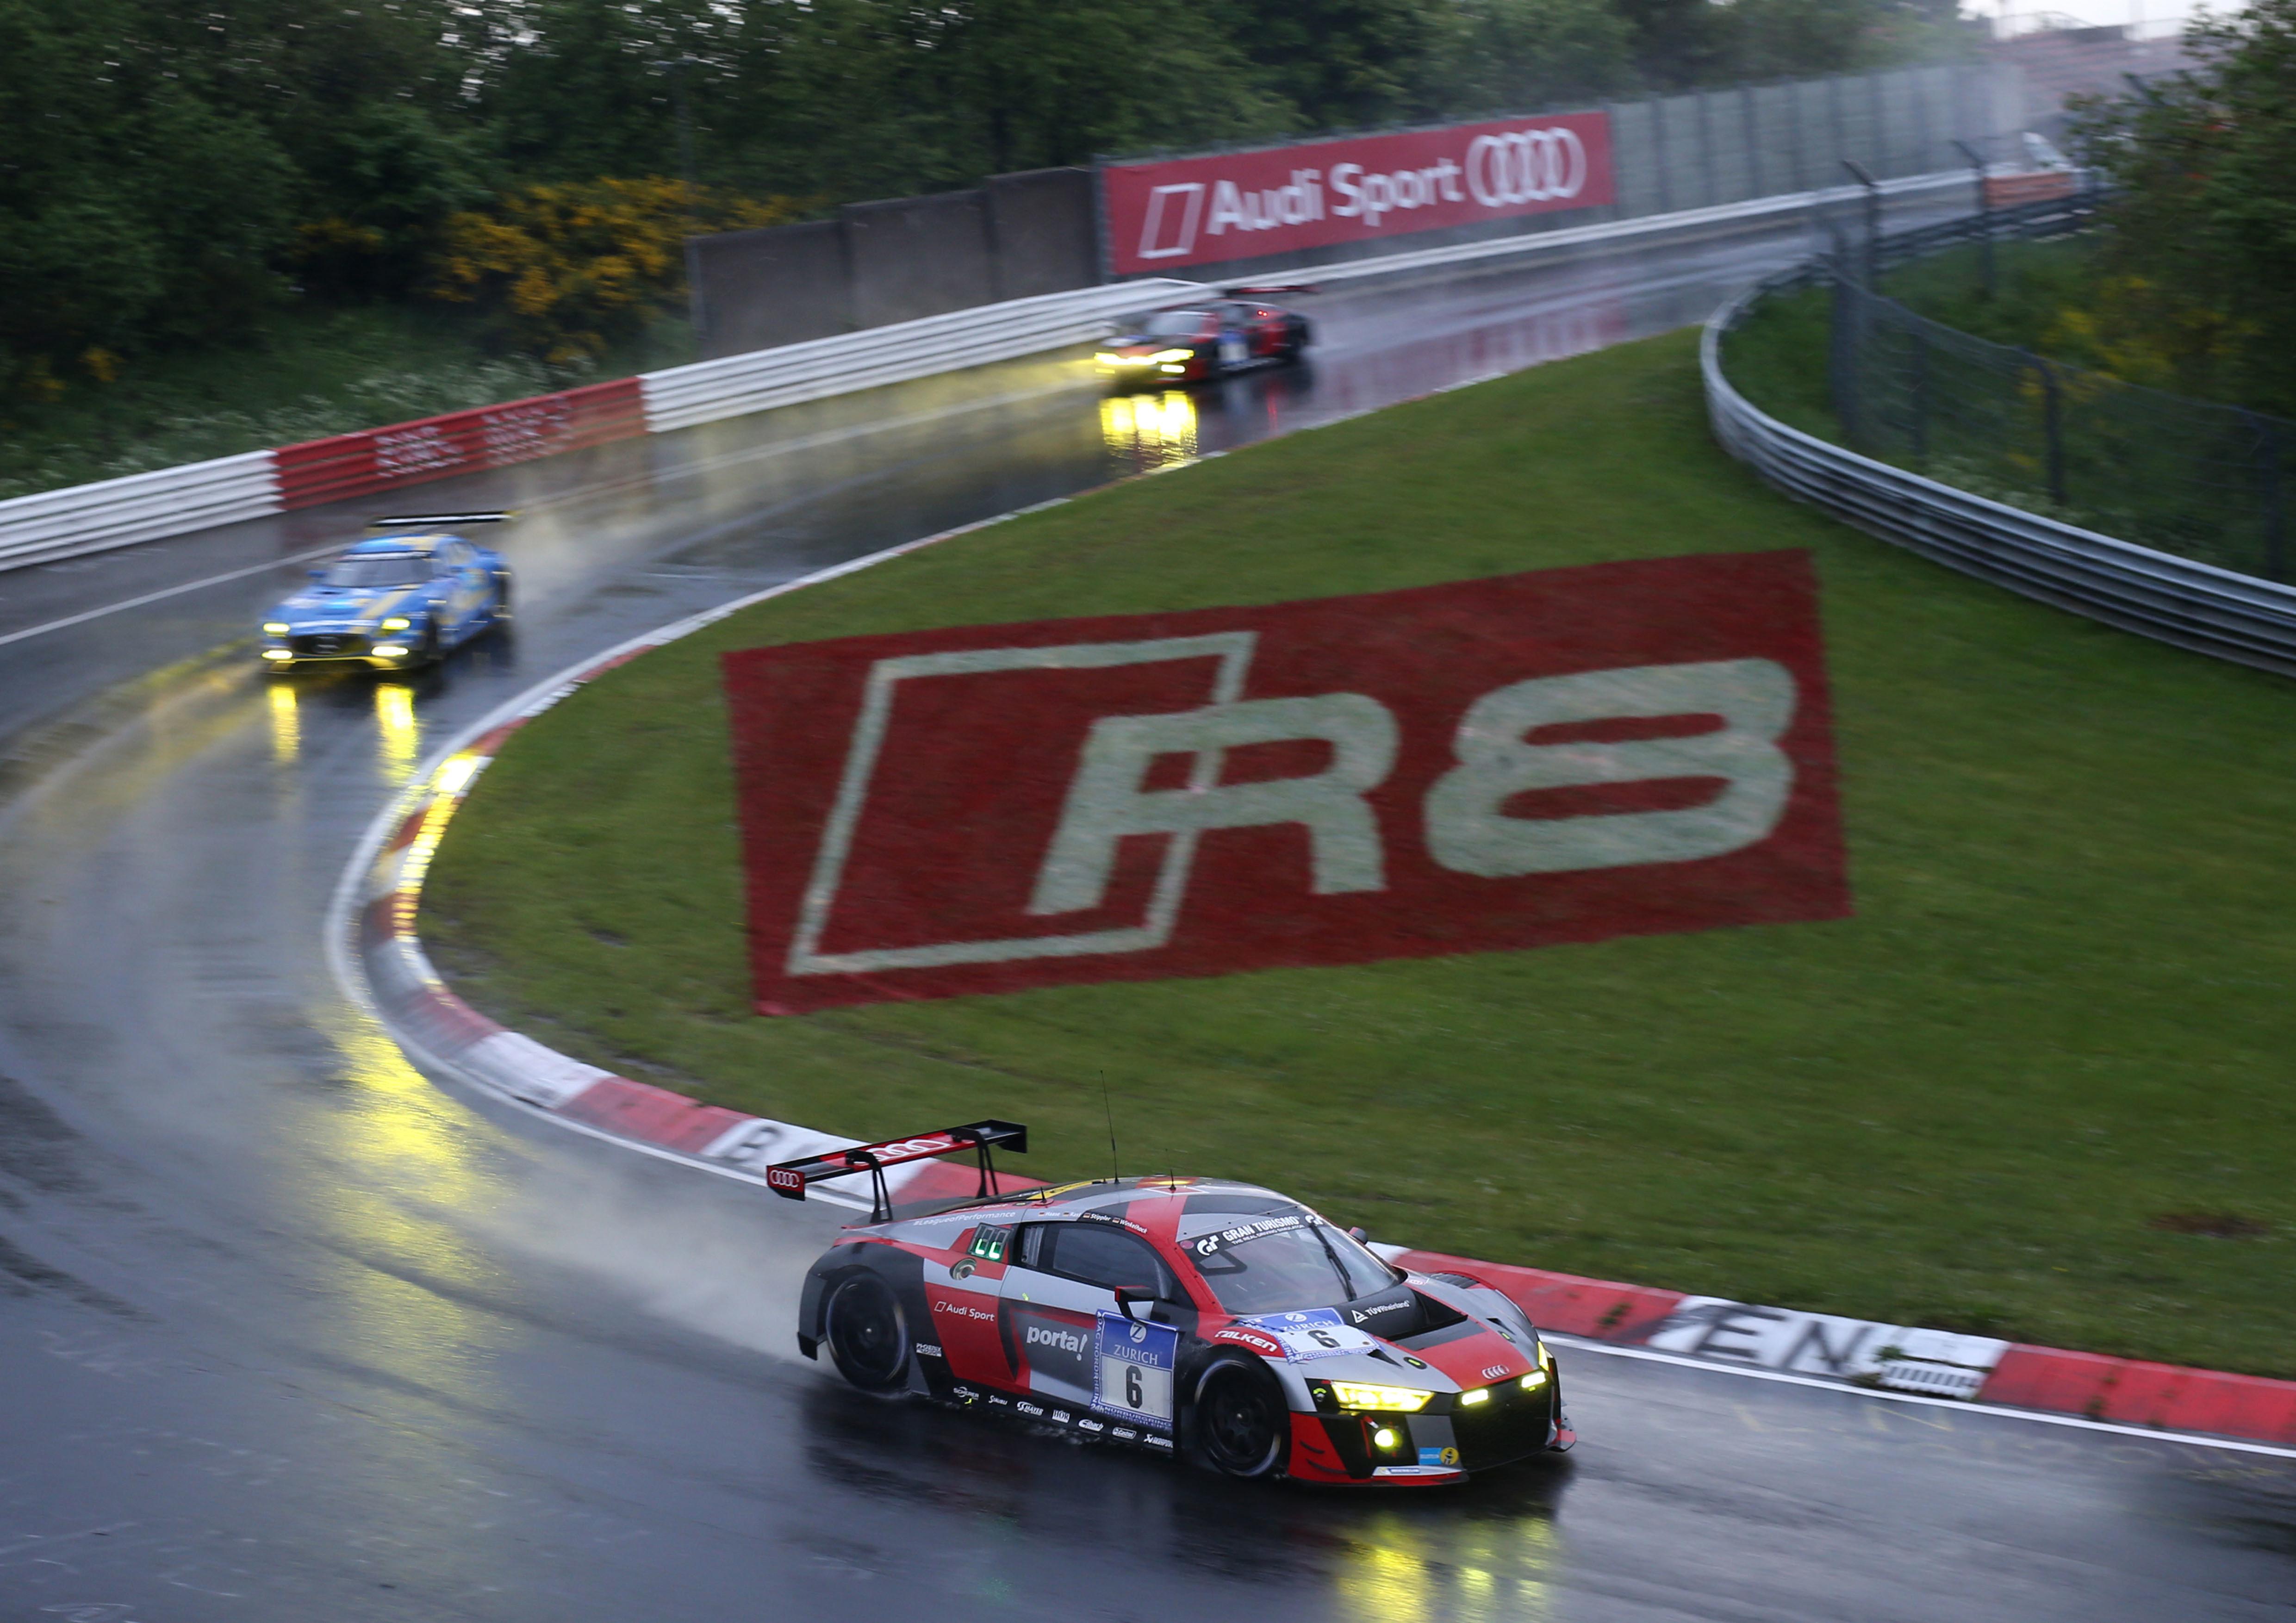 rene_rast_nurburgring_24_hours_audi-mediacenter-com-jpg.jpg